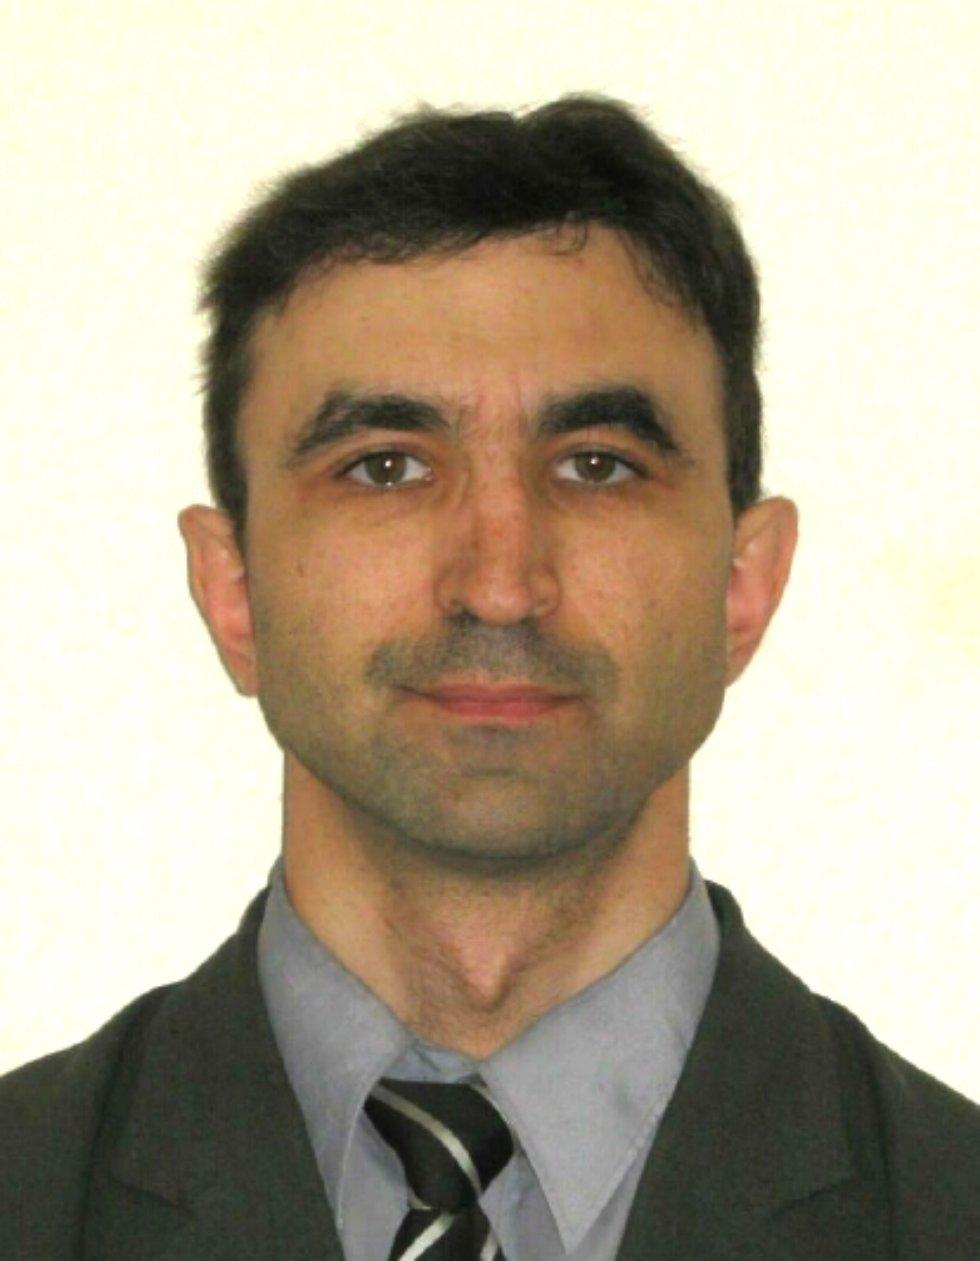 Бобков Дмитрий Вячеславович